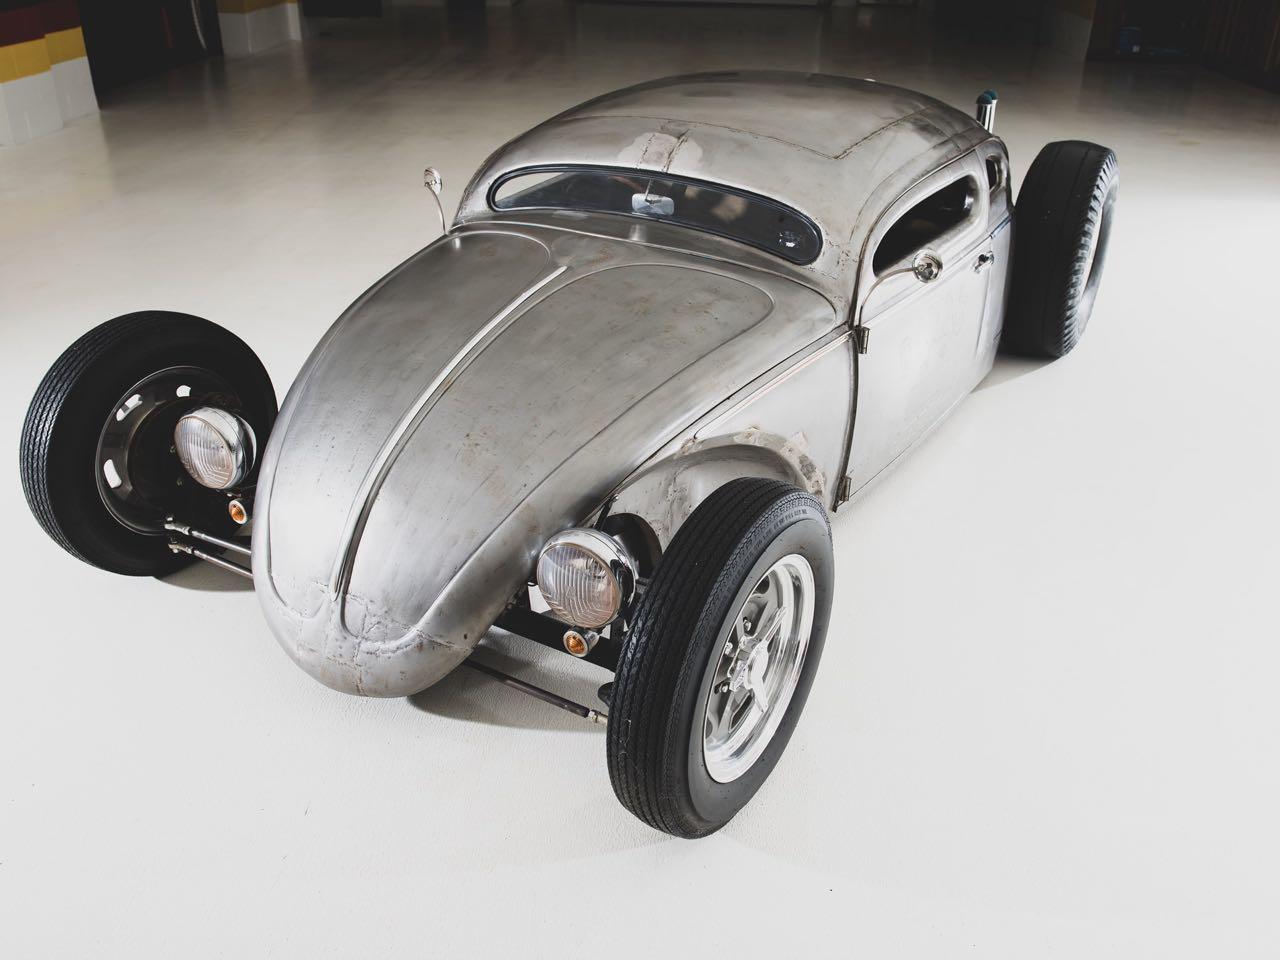 "'56 VW Beetle Outlaw ""Death"" by Franz Muhr - Heavy Metal ! 1"